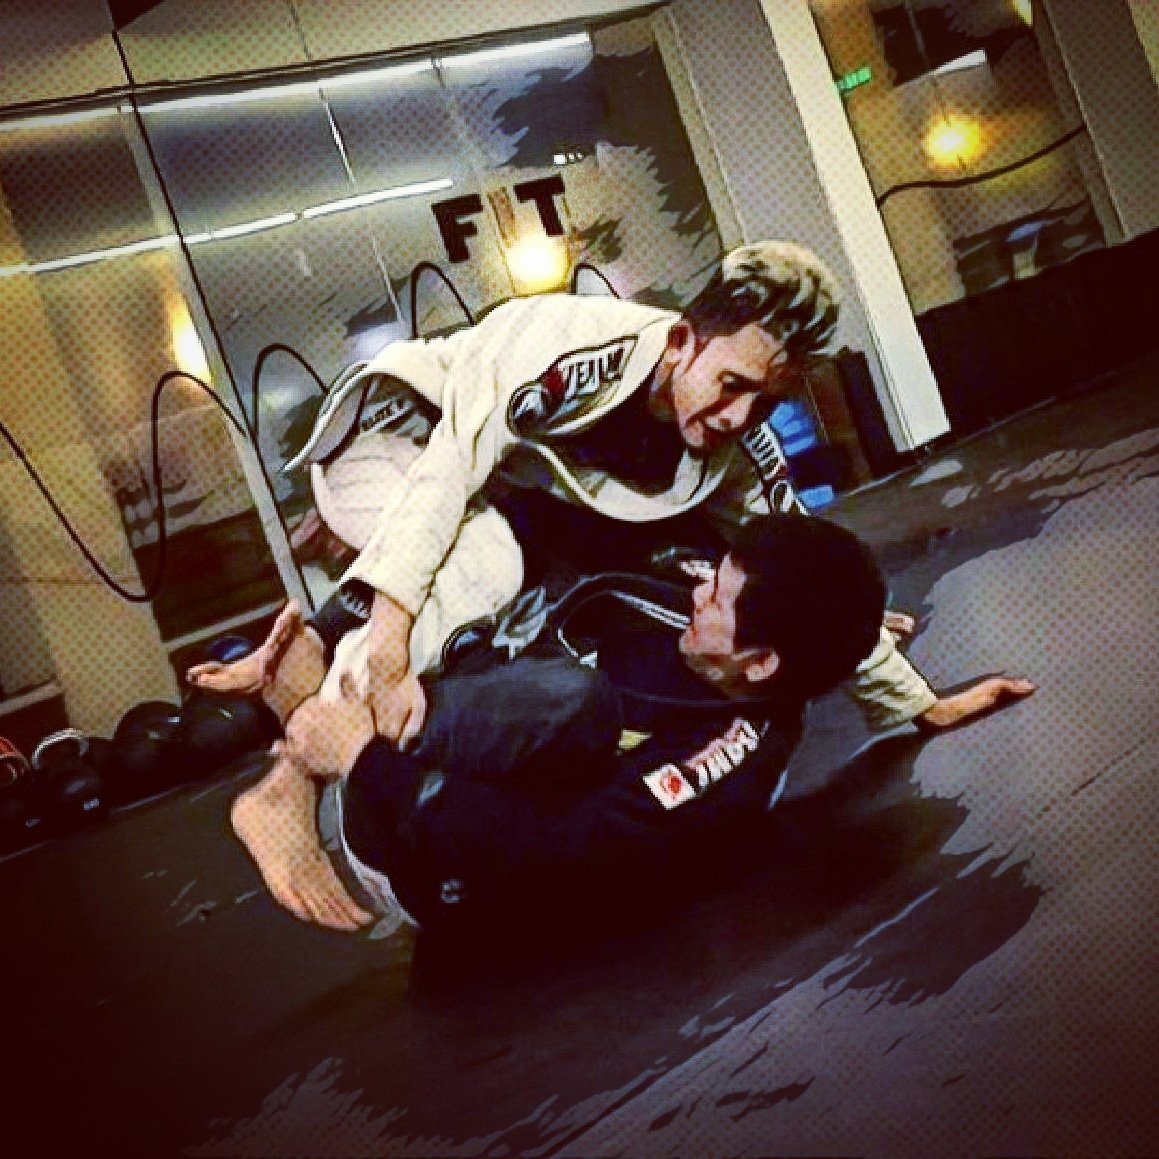 Kenapa Saya Memilih Brazilian Jiu Jitsu (BJJ) Sebagai Olah Raga Utama Di Usia Late 30s